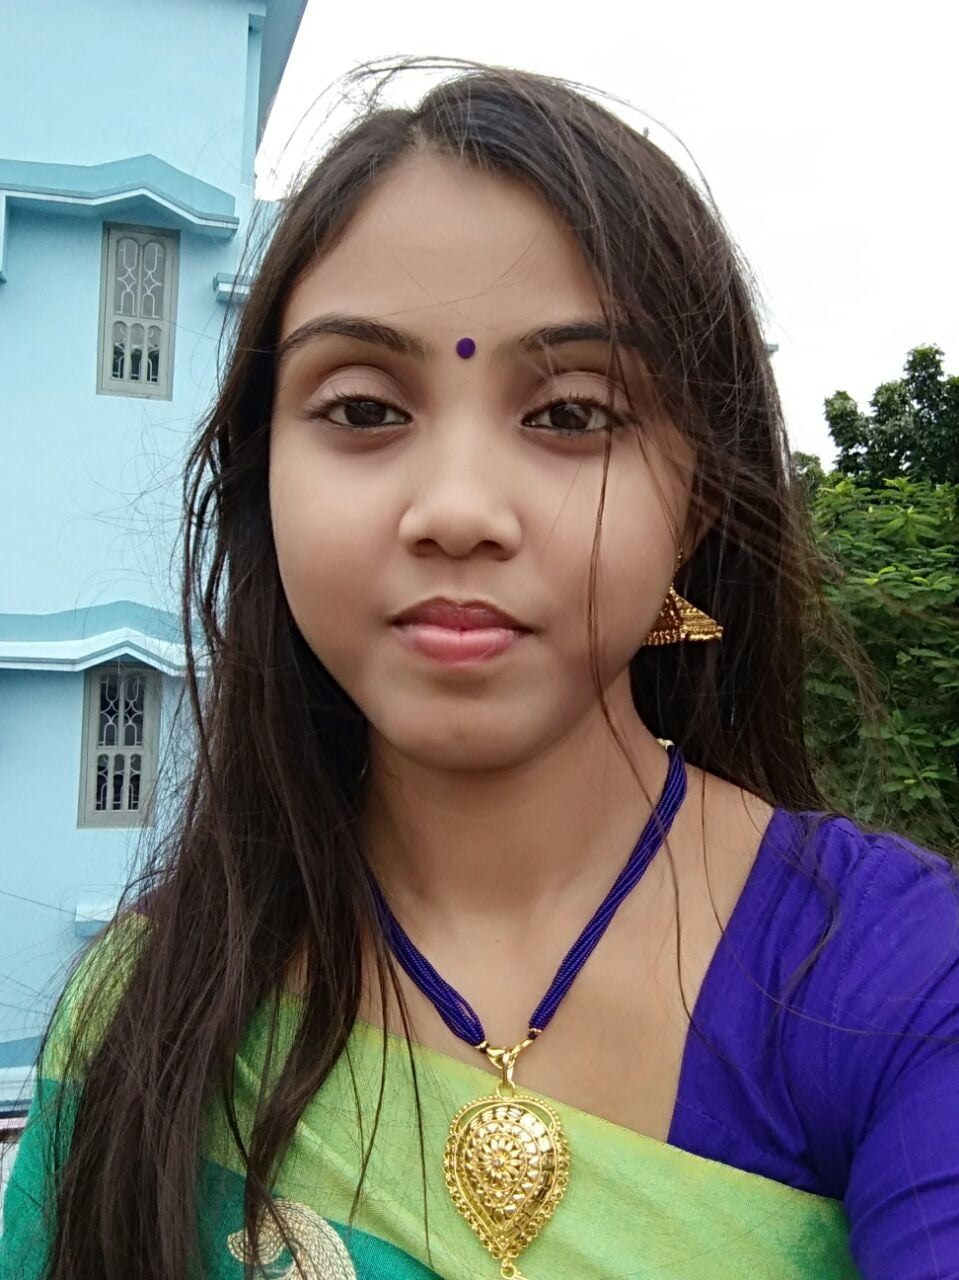 Hindu Dating Site. Muzica muzicala cauta femeie